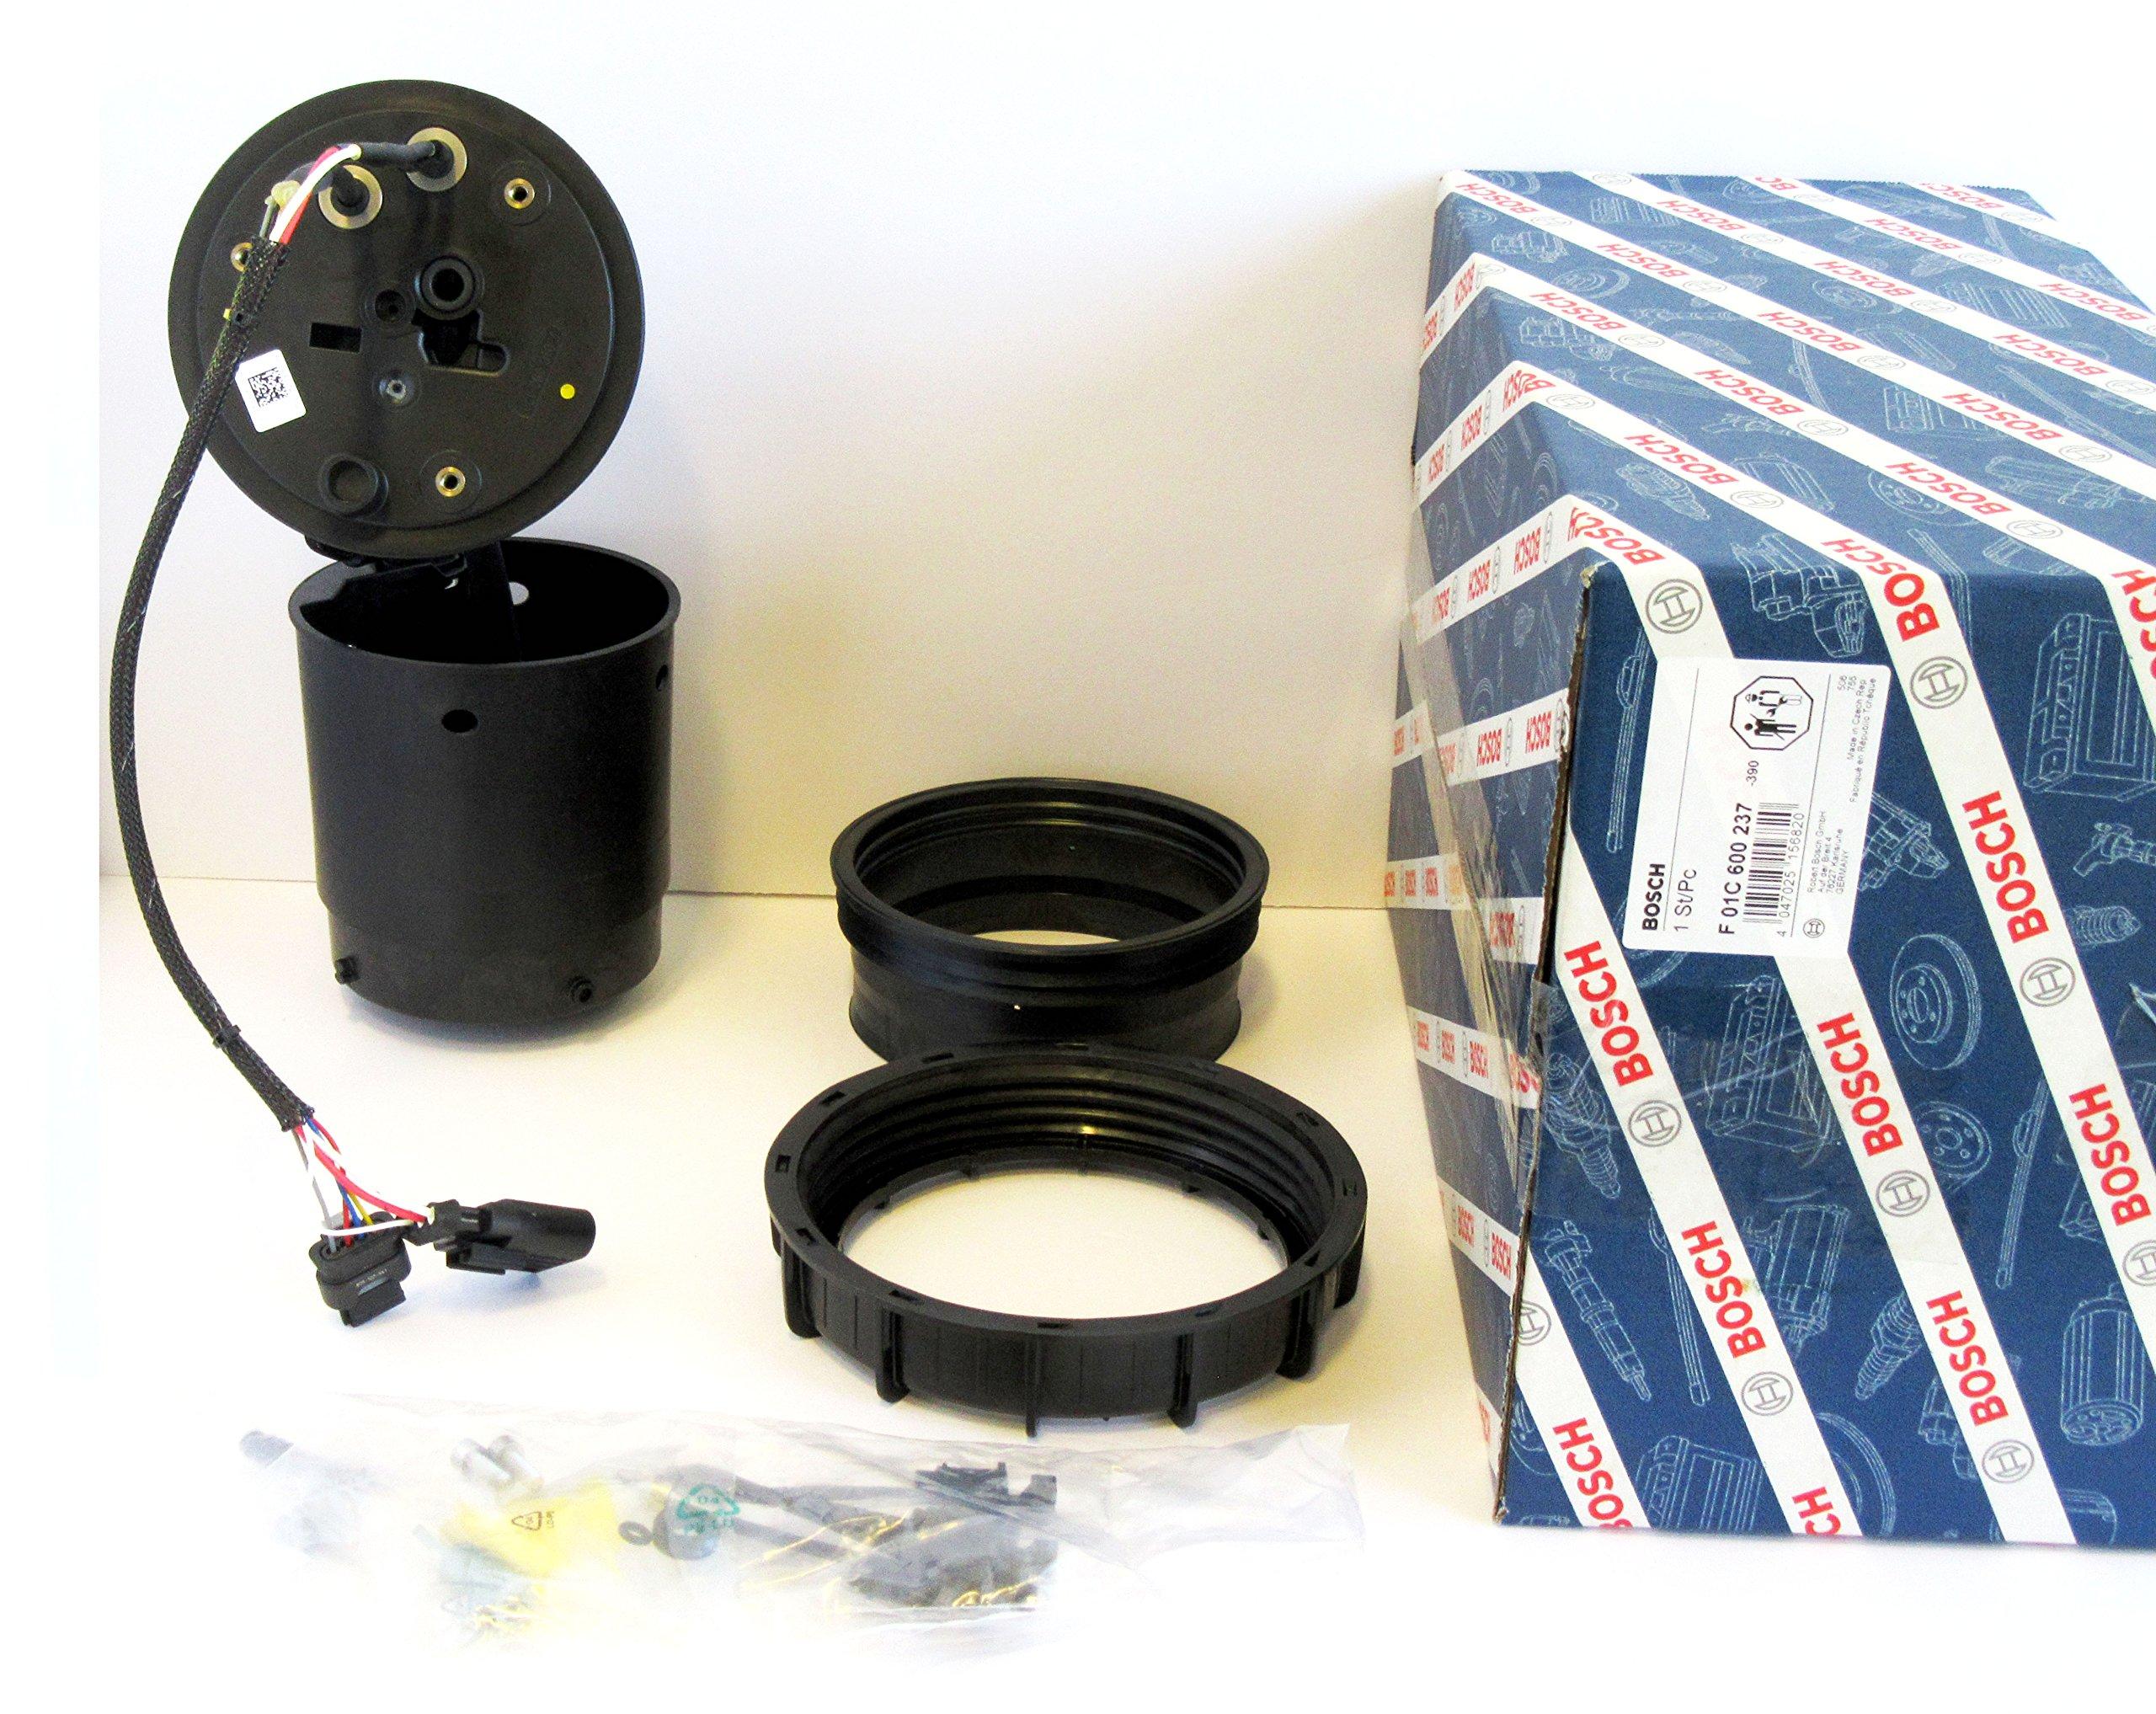 Bosch F01C600237 Diesel Exhaust Fluid (DEF) Heater Bosch Denox Heating Pot by Bosch